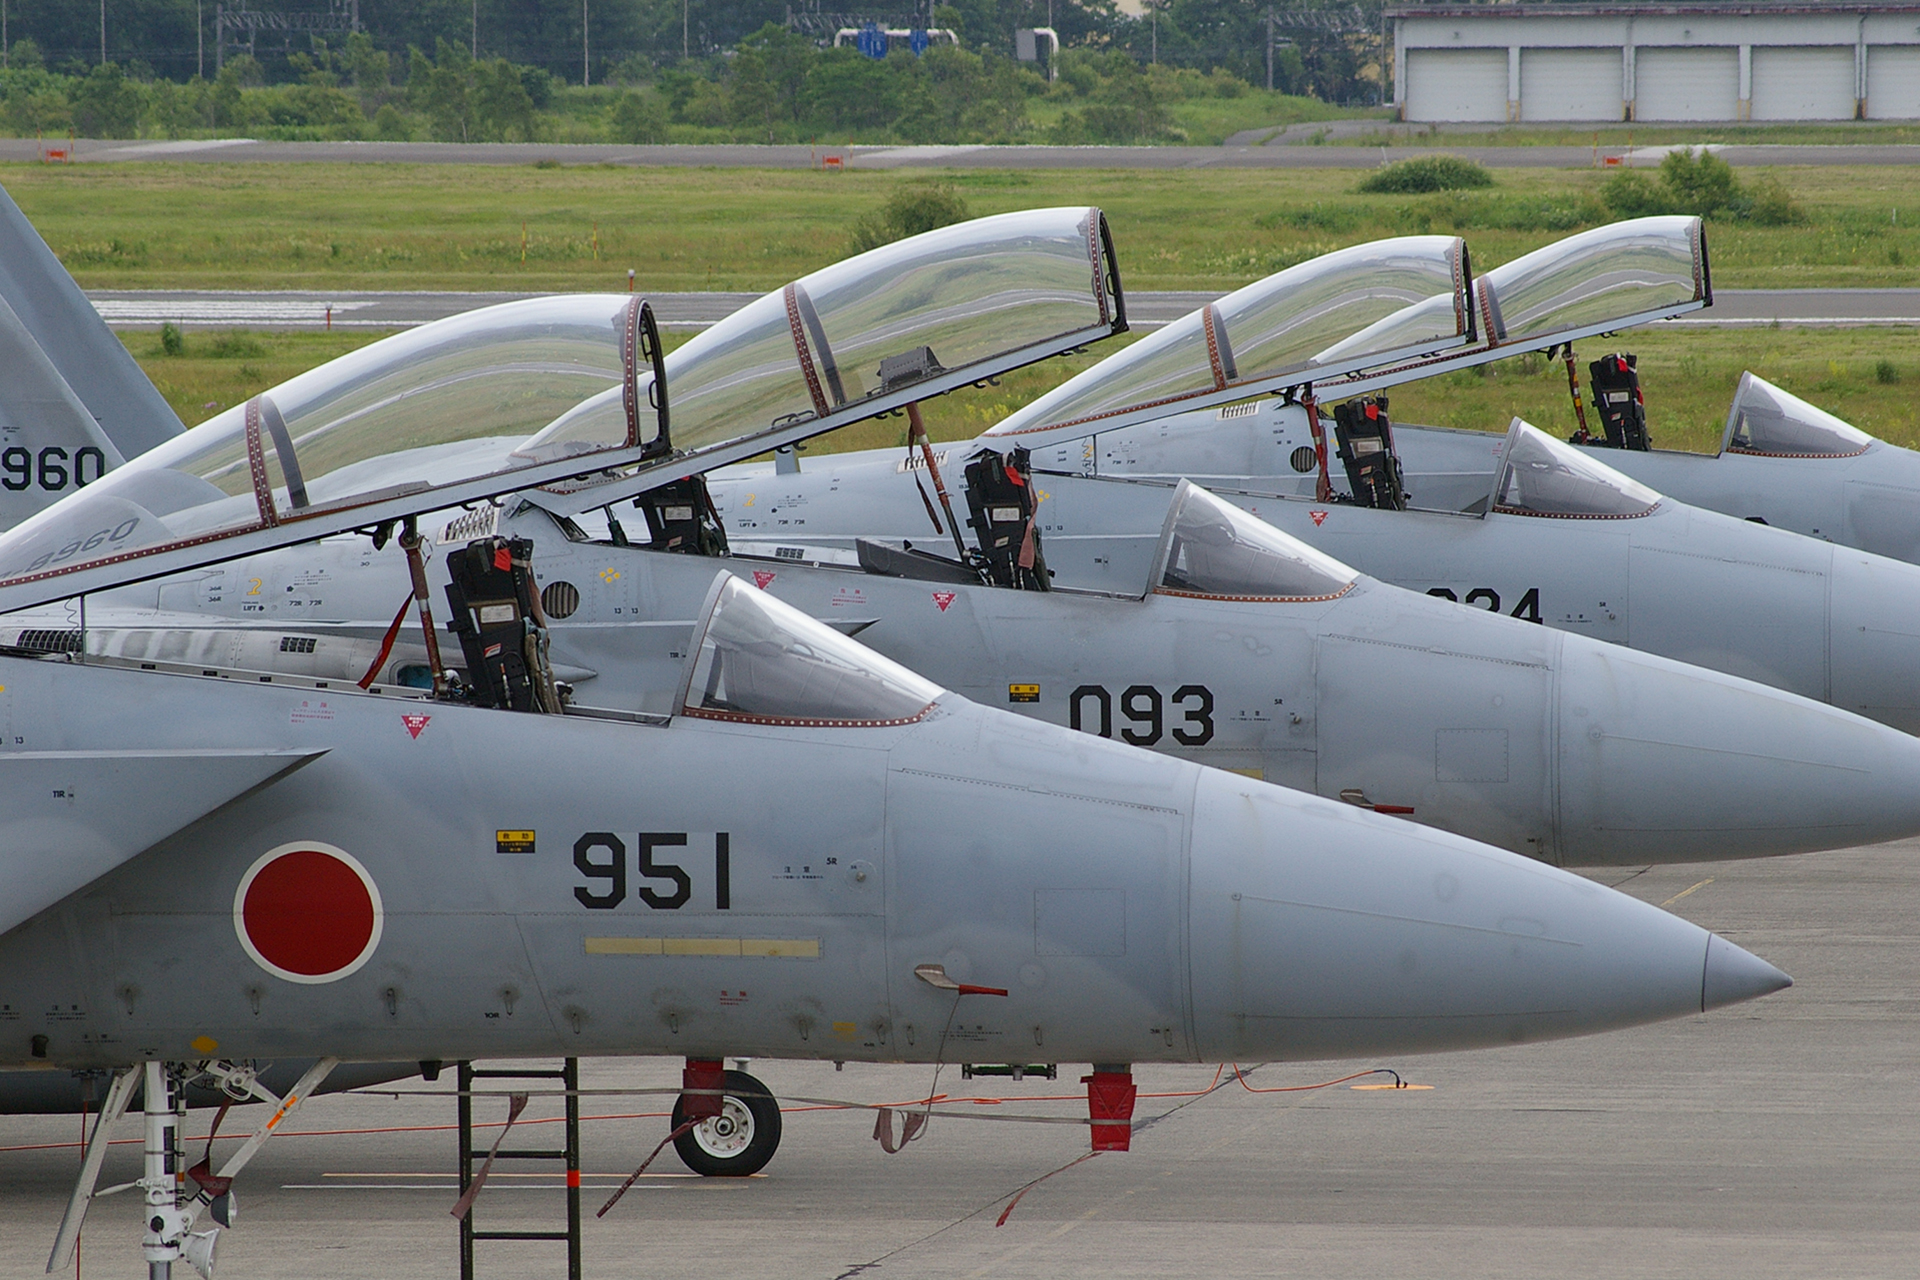 航空自衛隊、7月1日に南西航空混成団を「南西航空方面隊」へ新編 ...